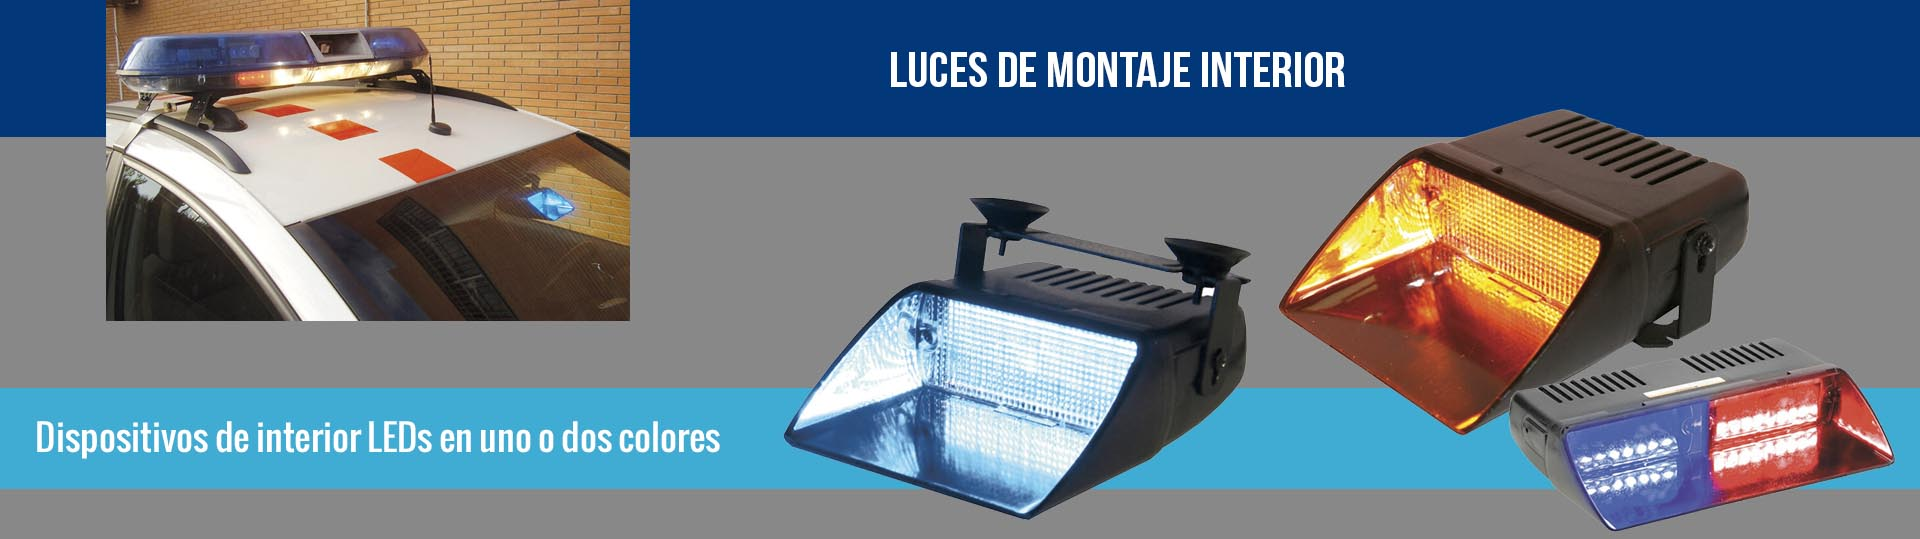 slider-luces-interior